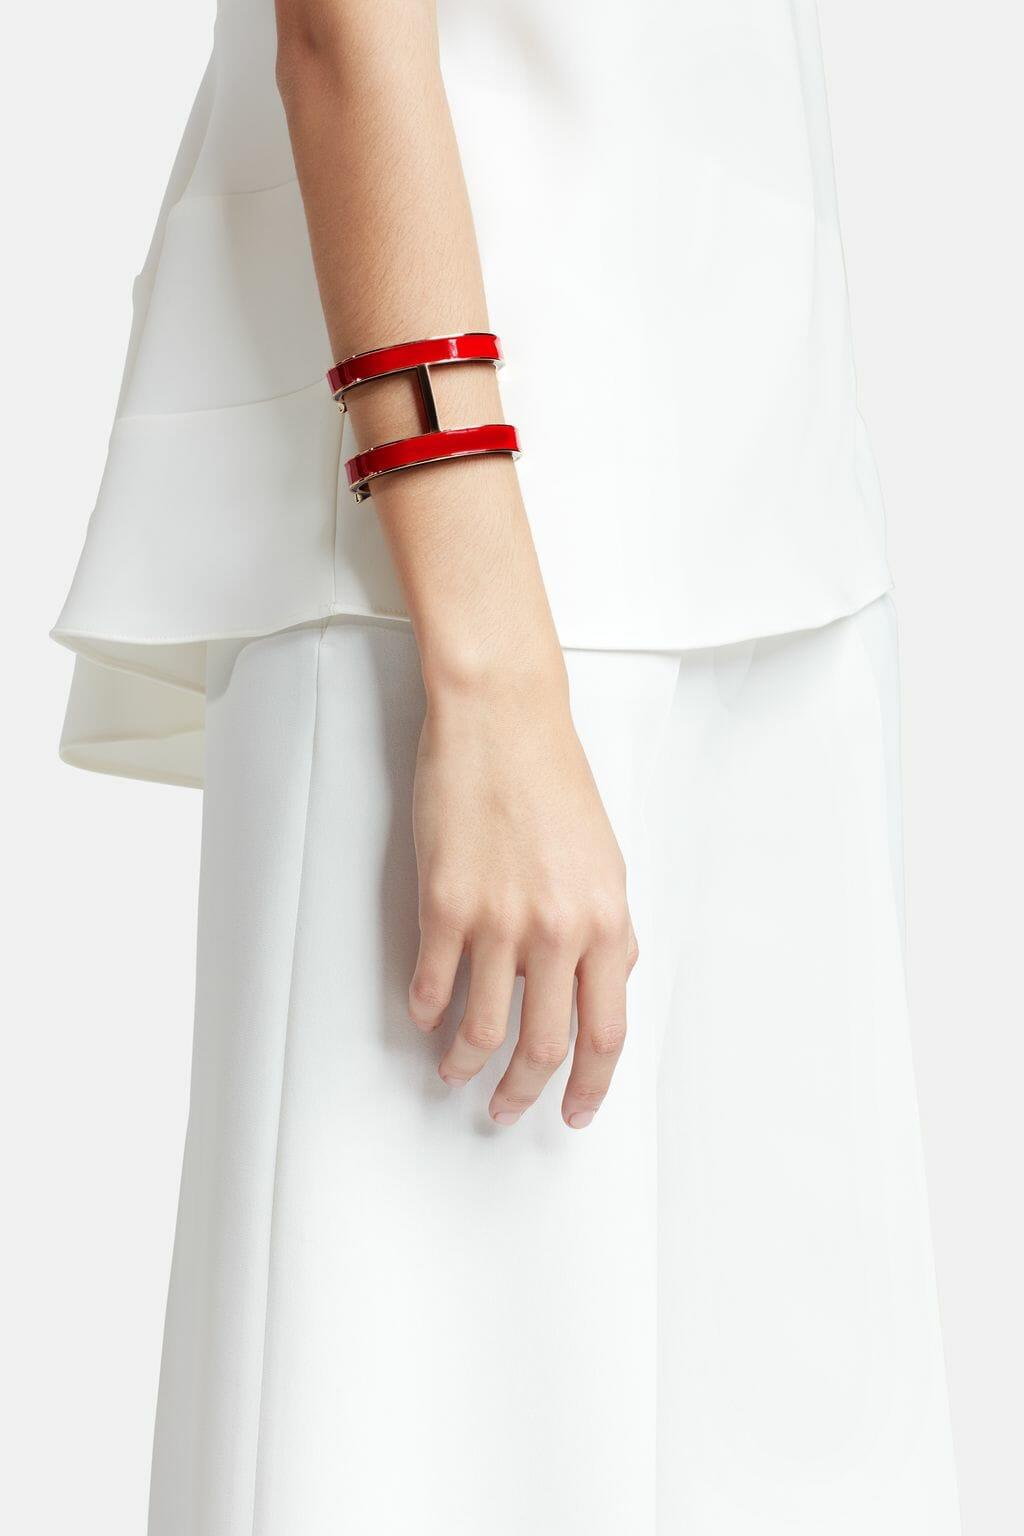 CH-Carolina-herrera-insignia-jewelry-look-5